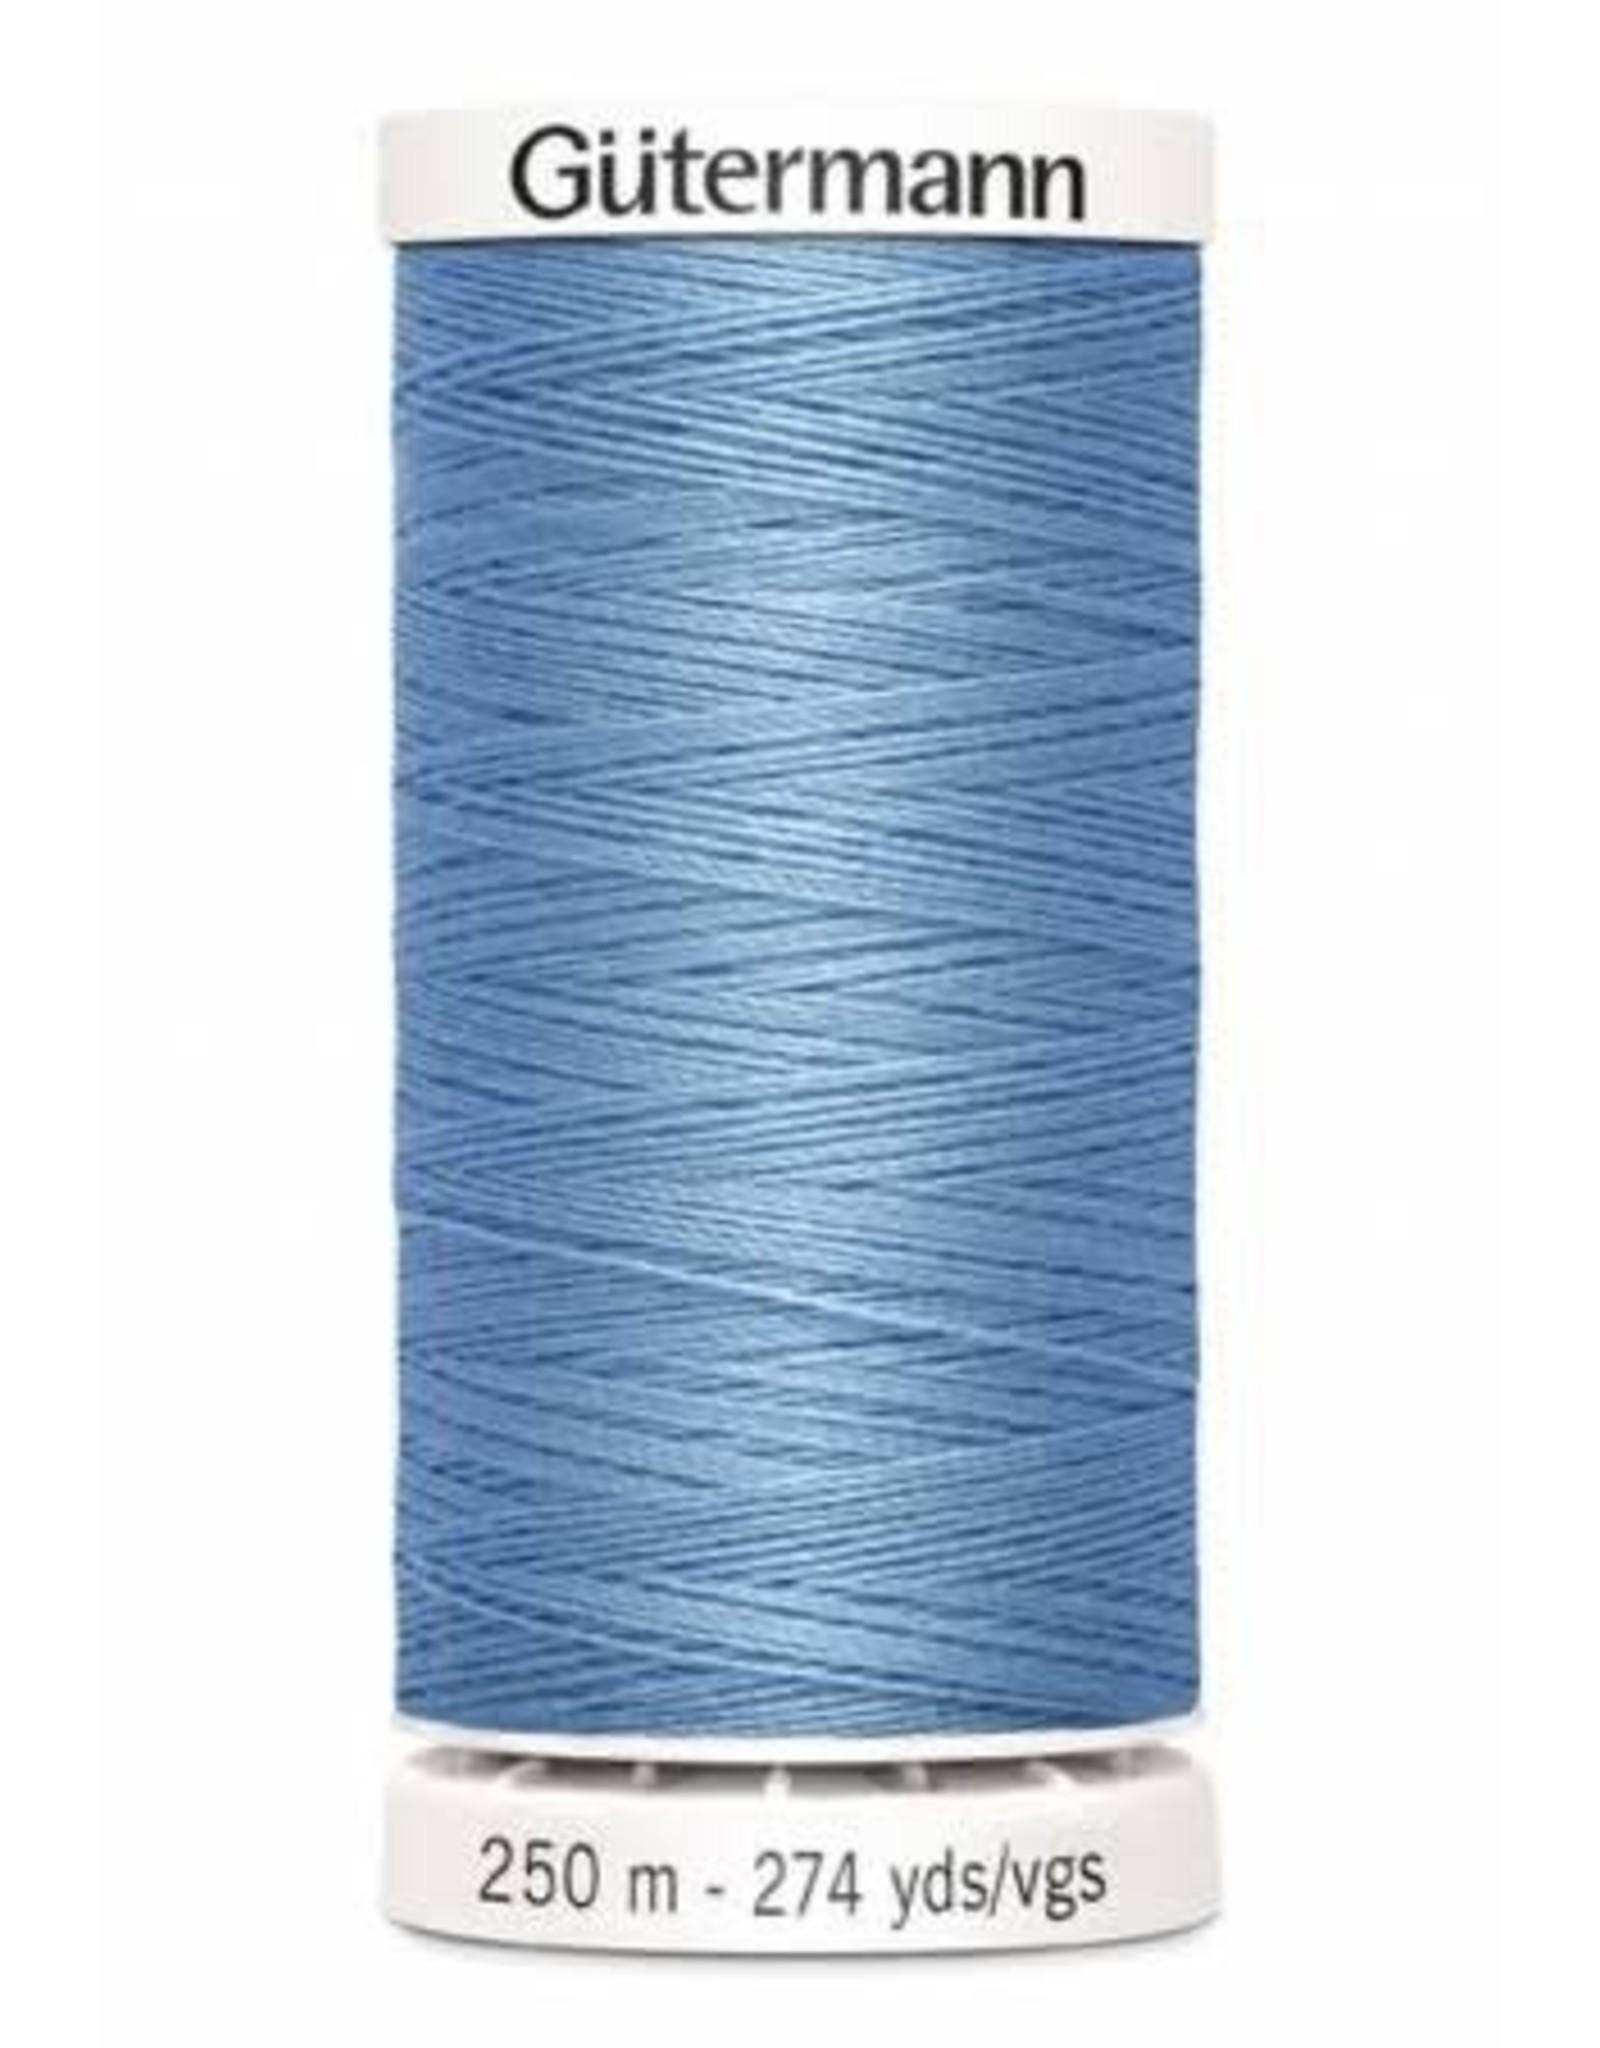 Gutermann Gutermann Thread, 250M-227 Copenhagen Blue, Sew-All Polyester All Purpose Thread, 250m/273yds